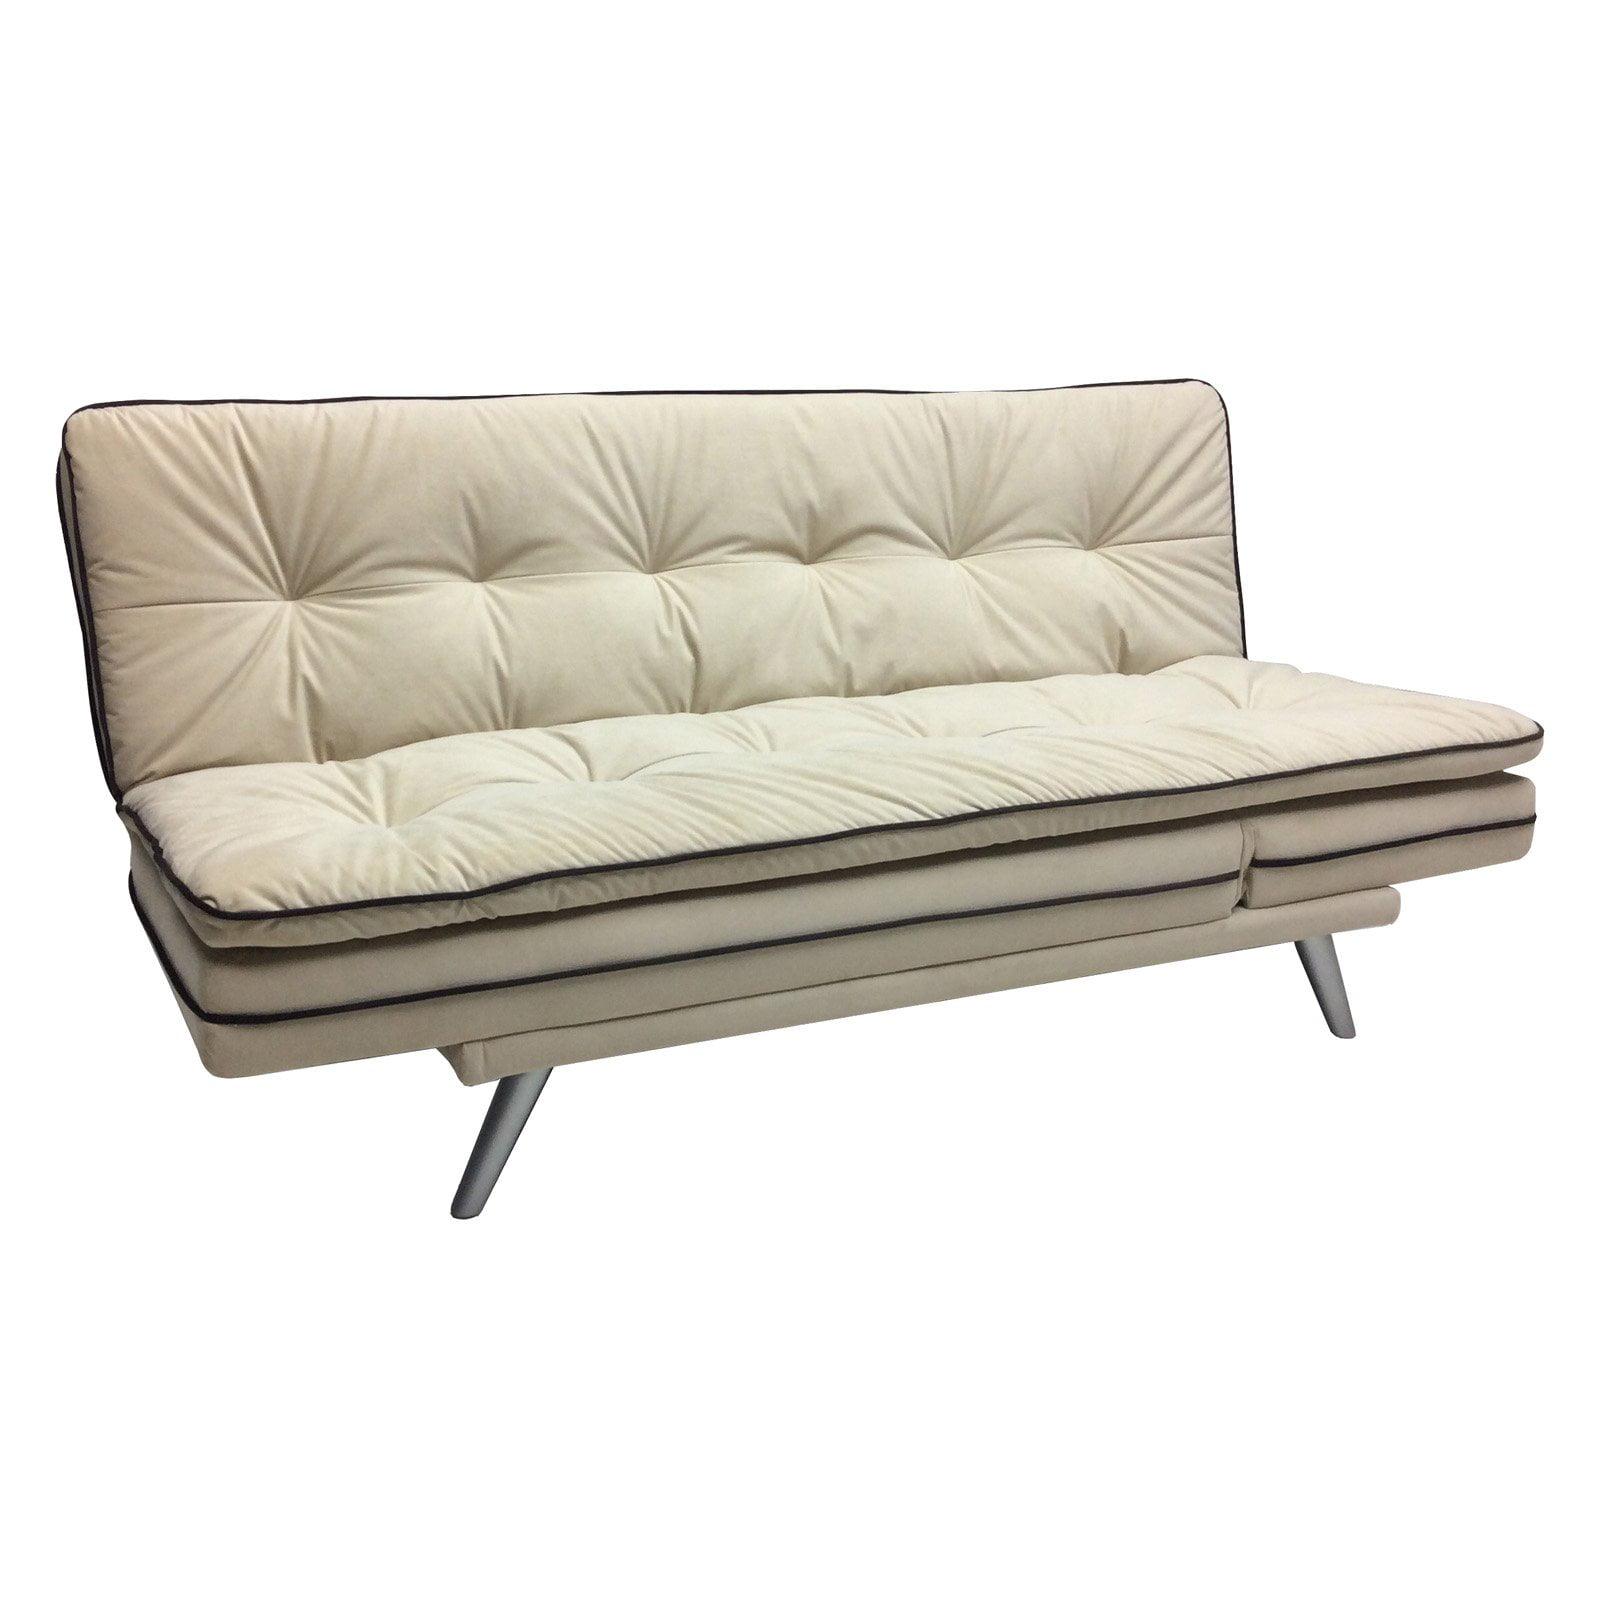 Milton Greens Stars Tudela 3-in-1 Multi-Function Convertible Sofa